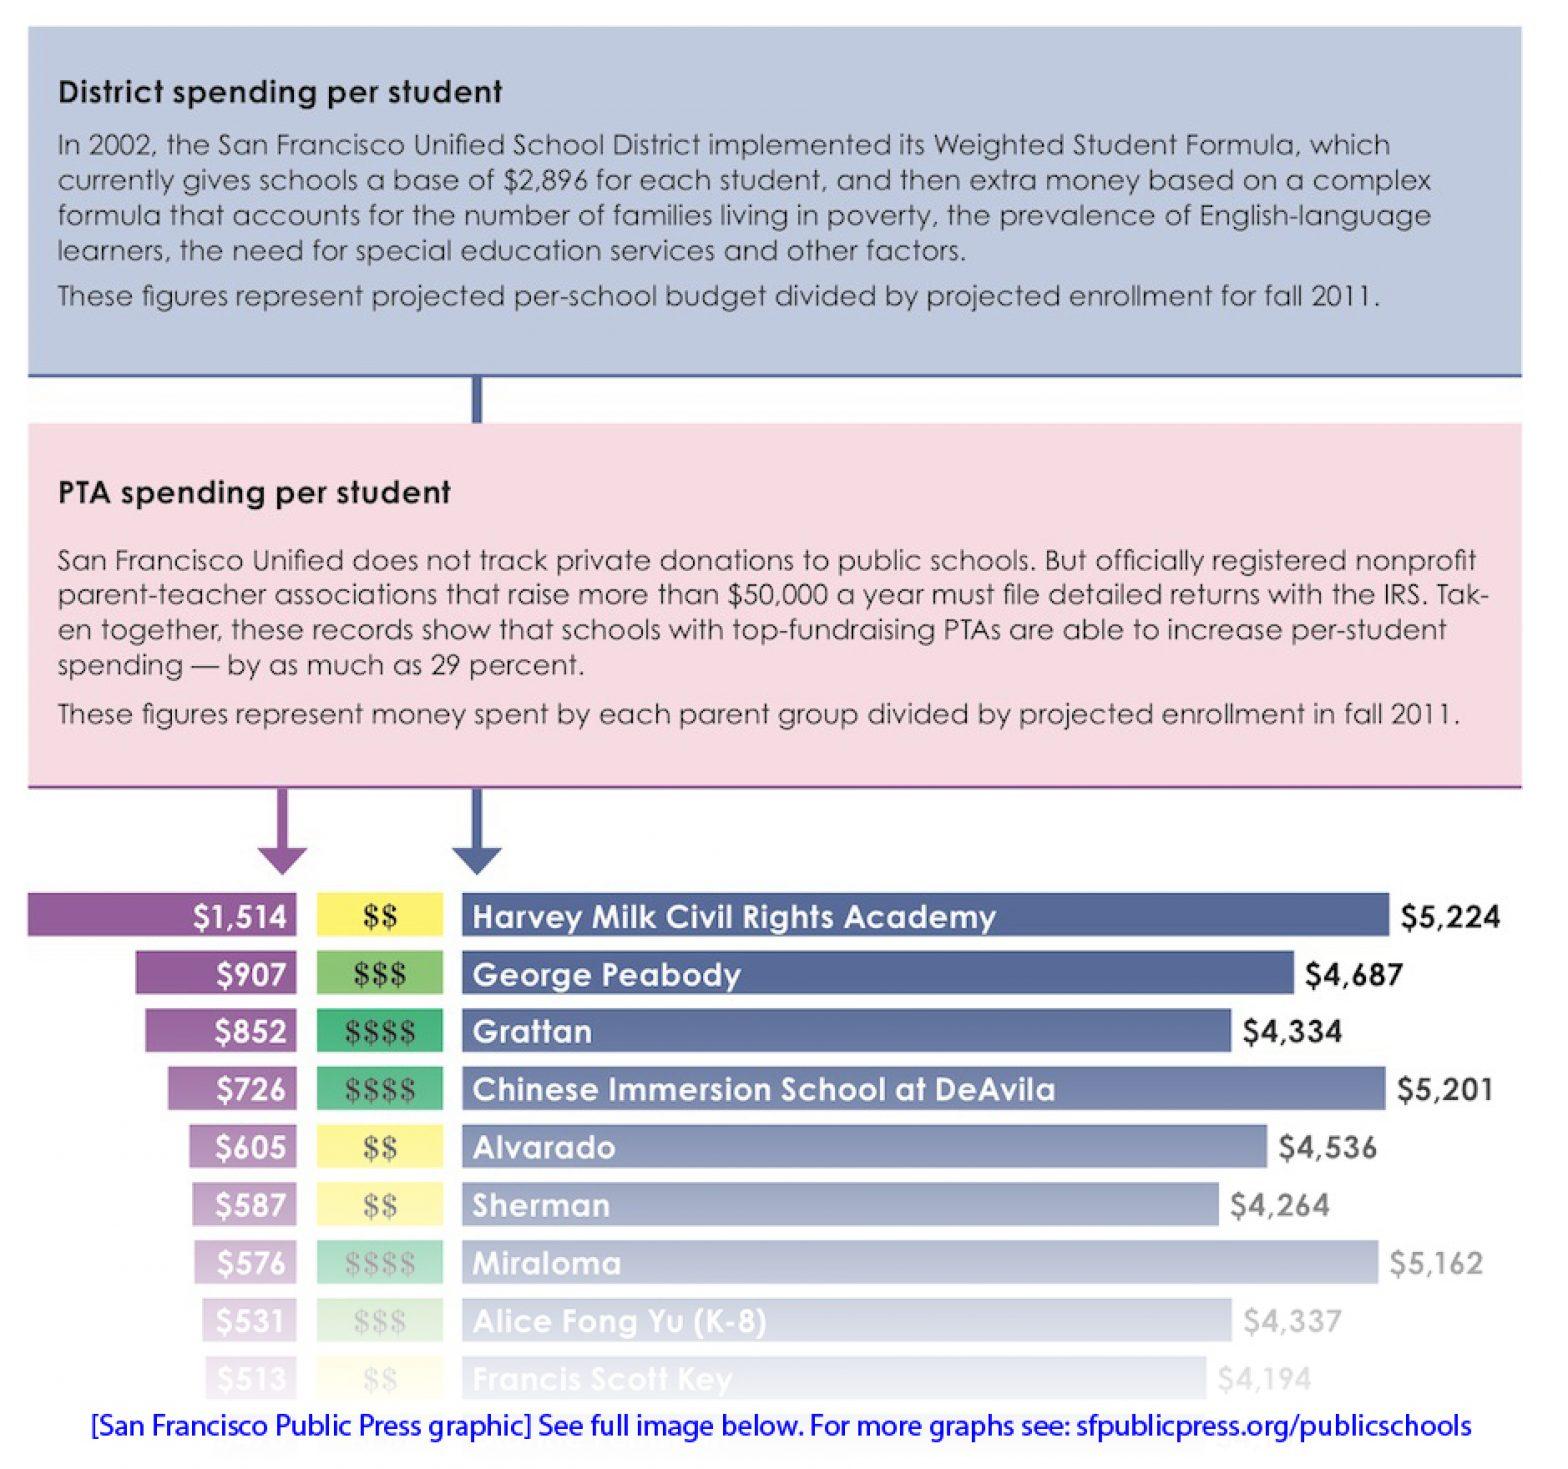 public-schools-main-graphic-abridged.jpg